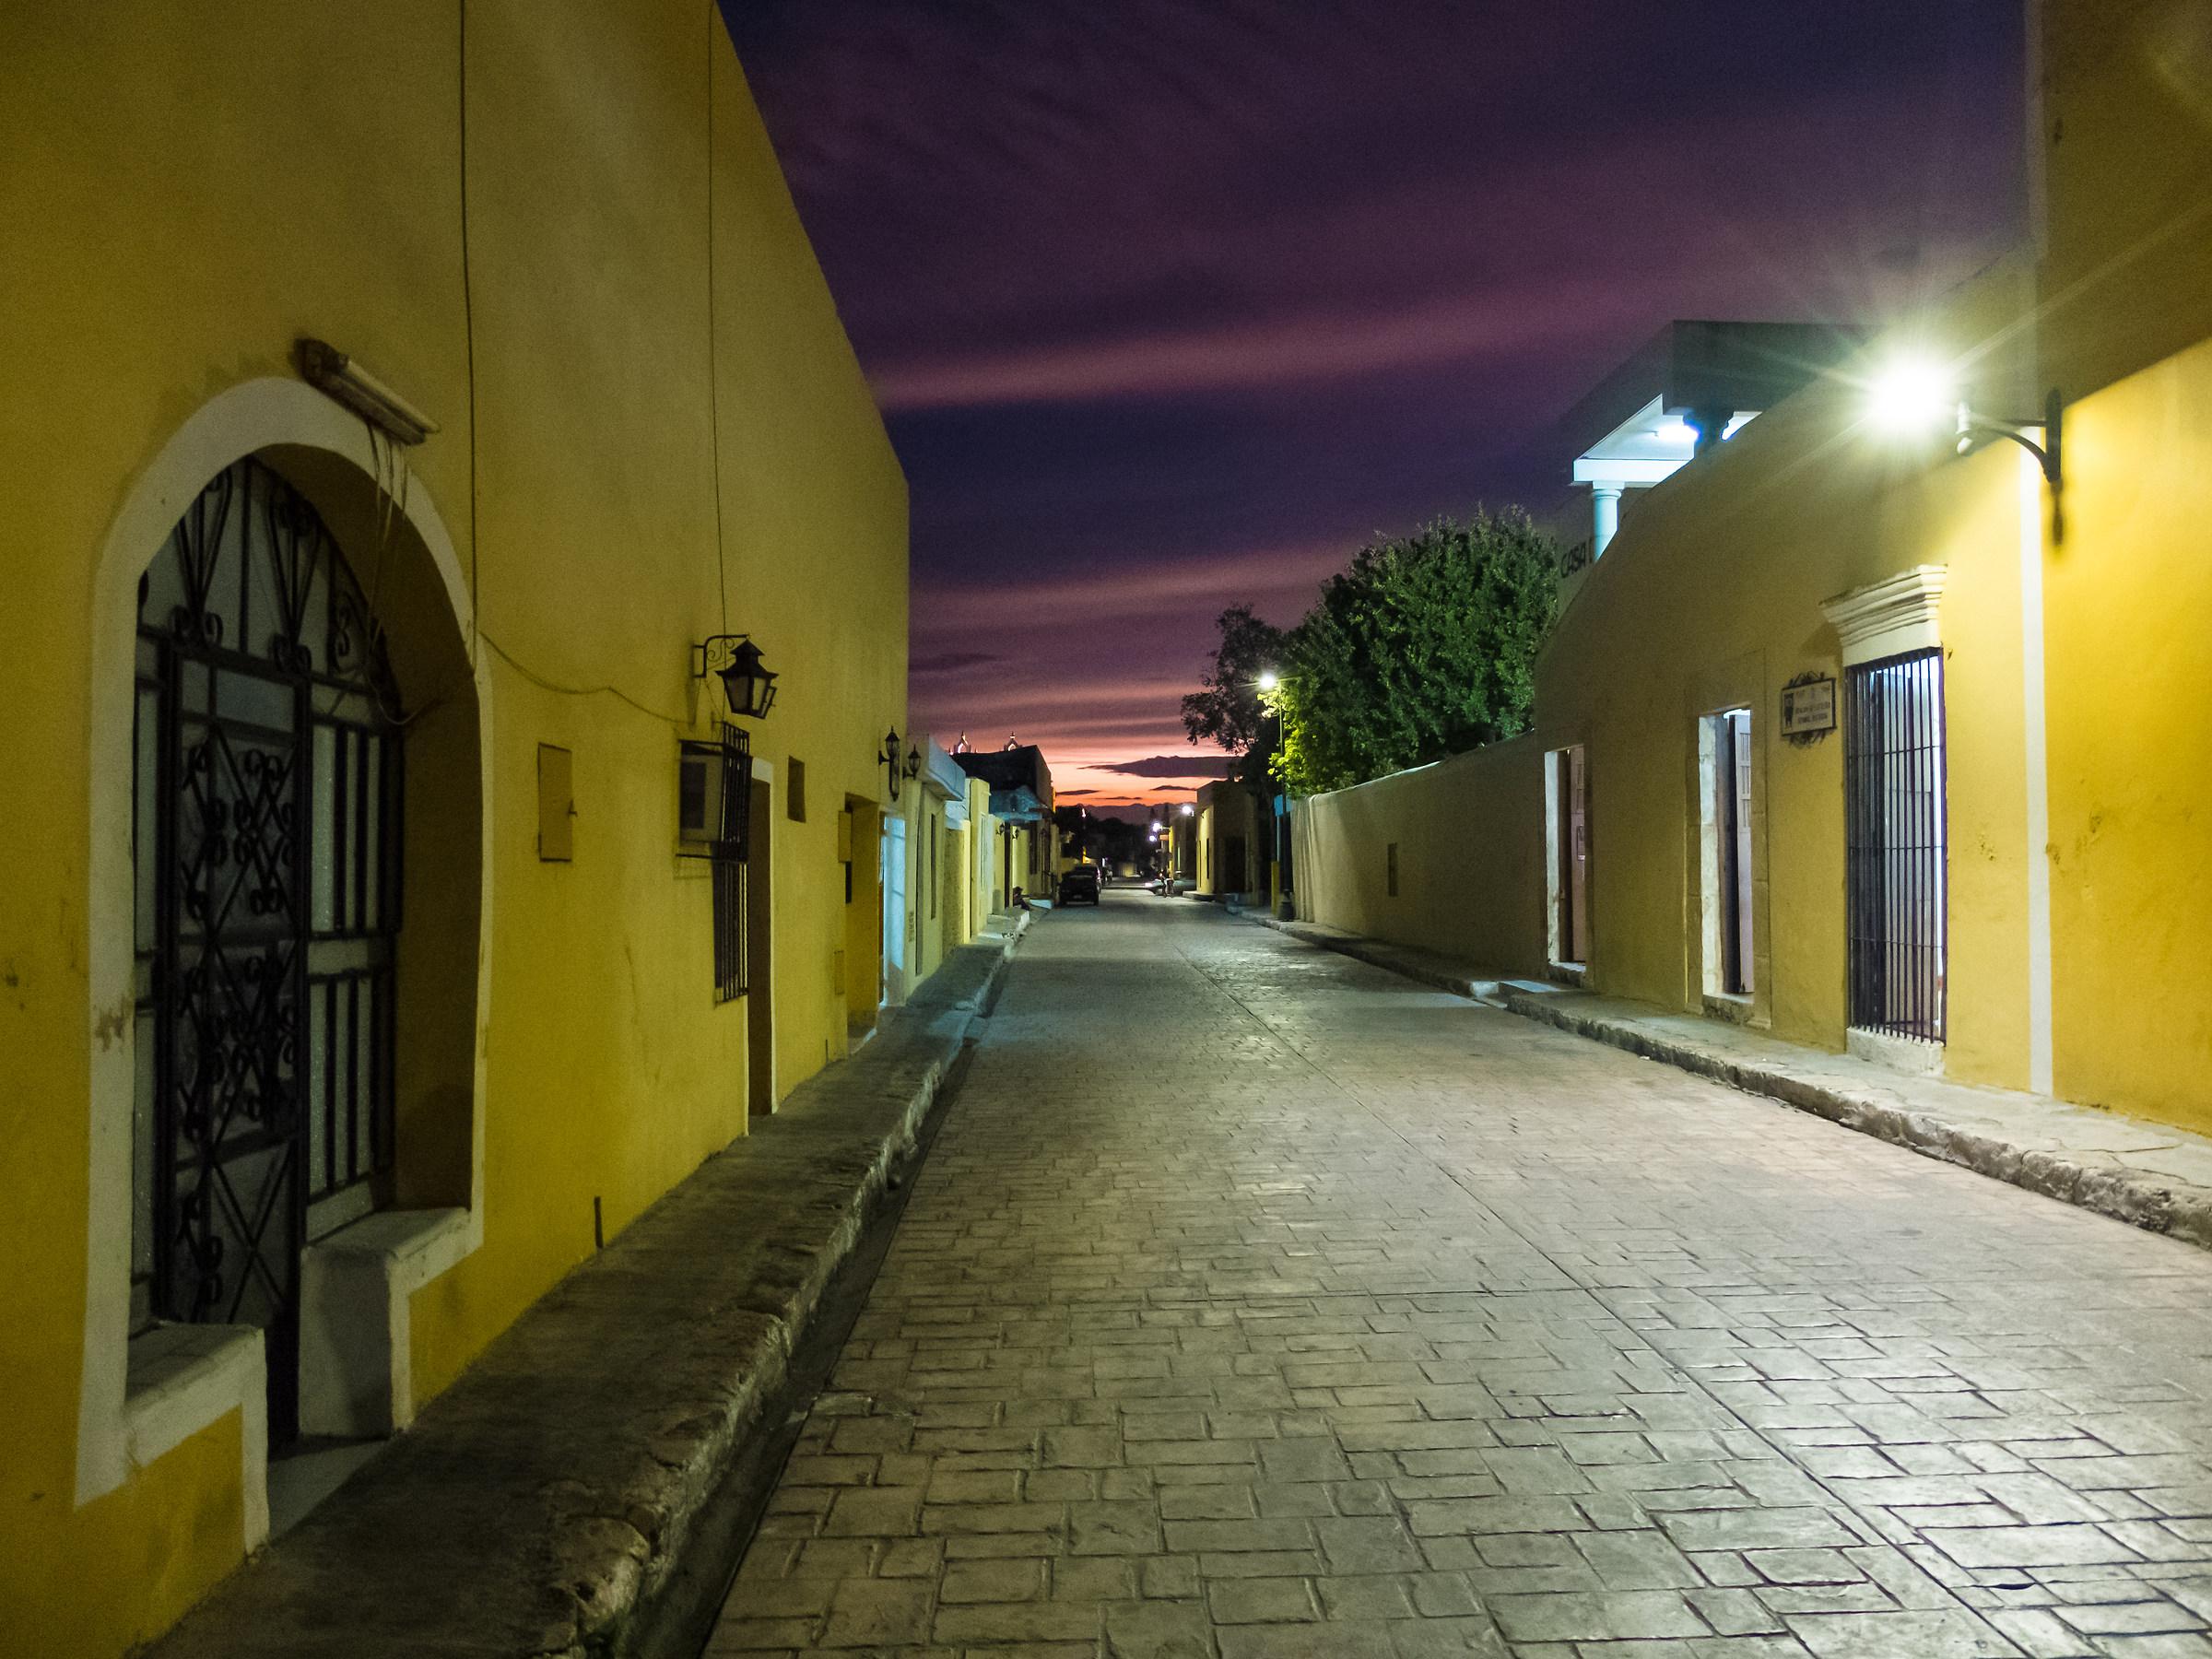 Sunset on the streets of Izamal...